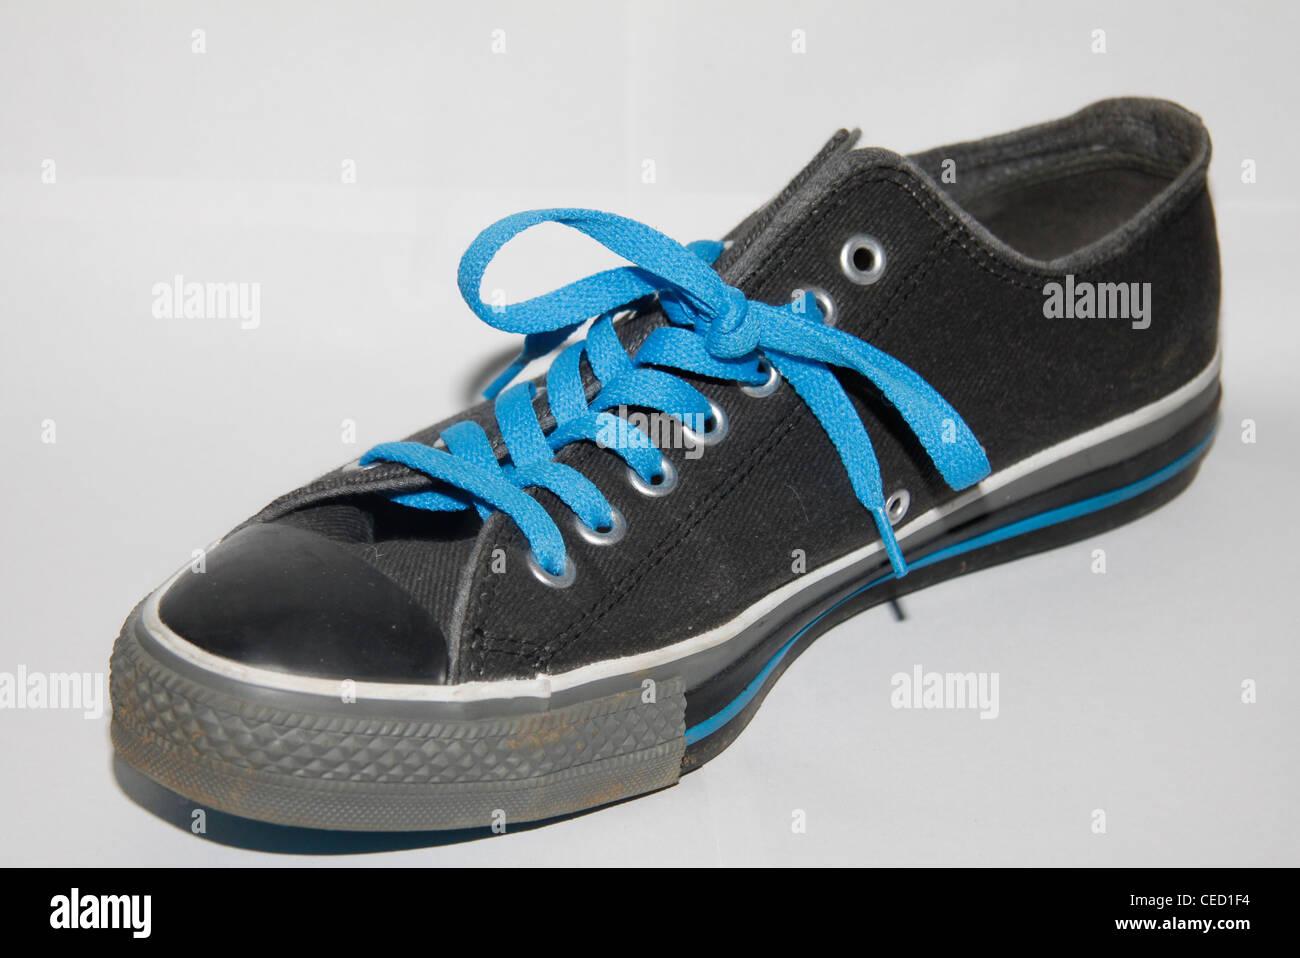 9d1f2396daae3f Black Converse Shoe Stock Photos   Black Converse Shoe Stock Images ...